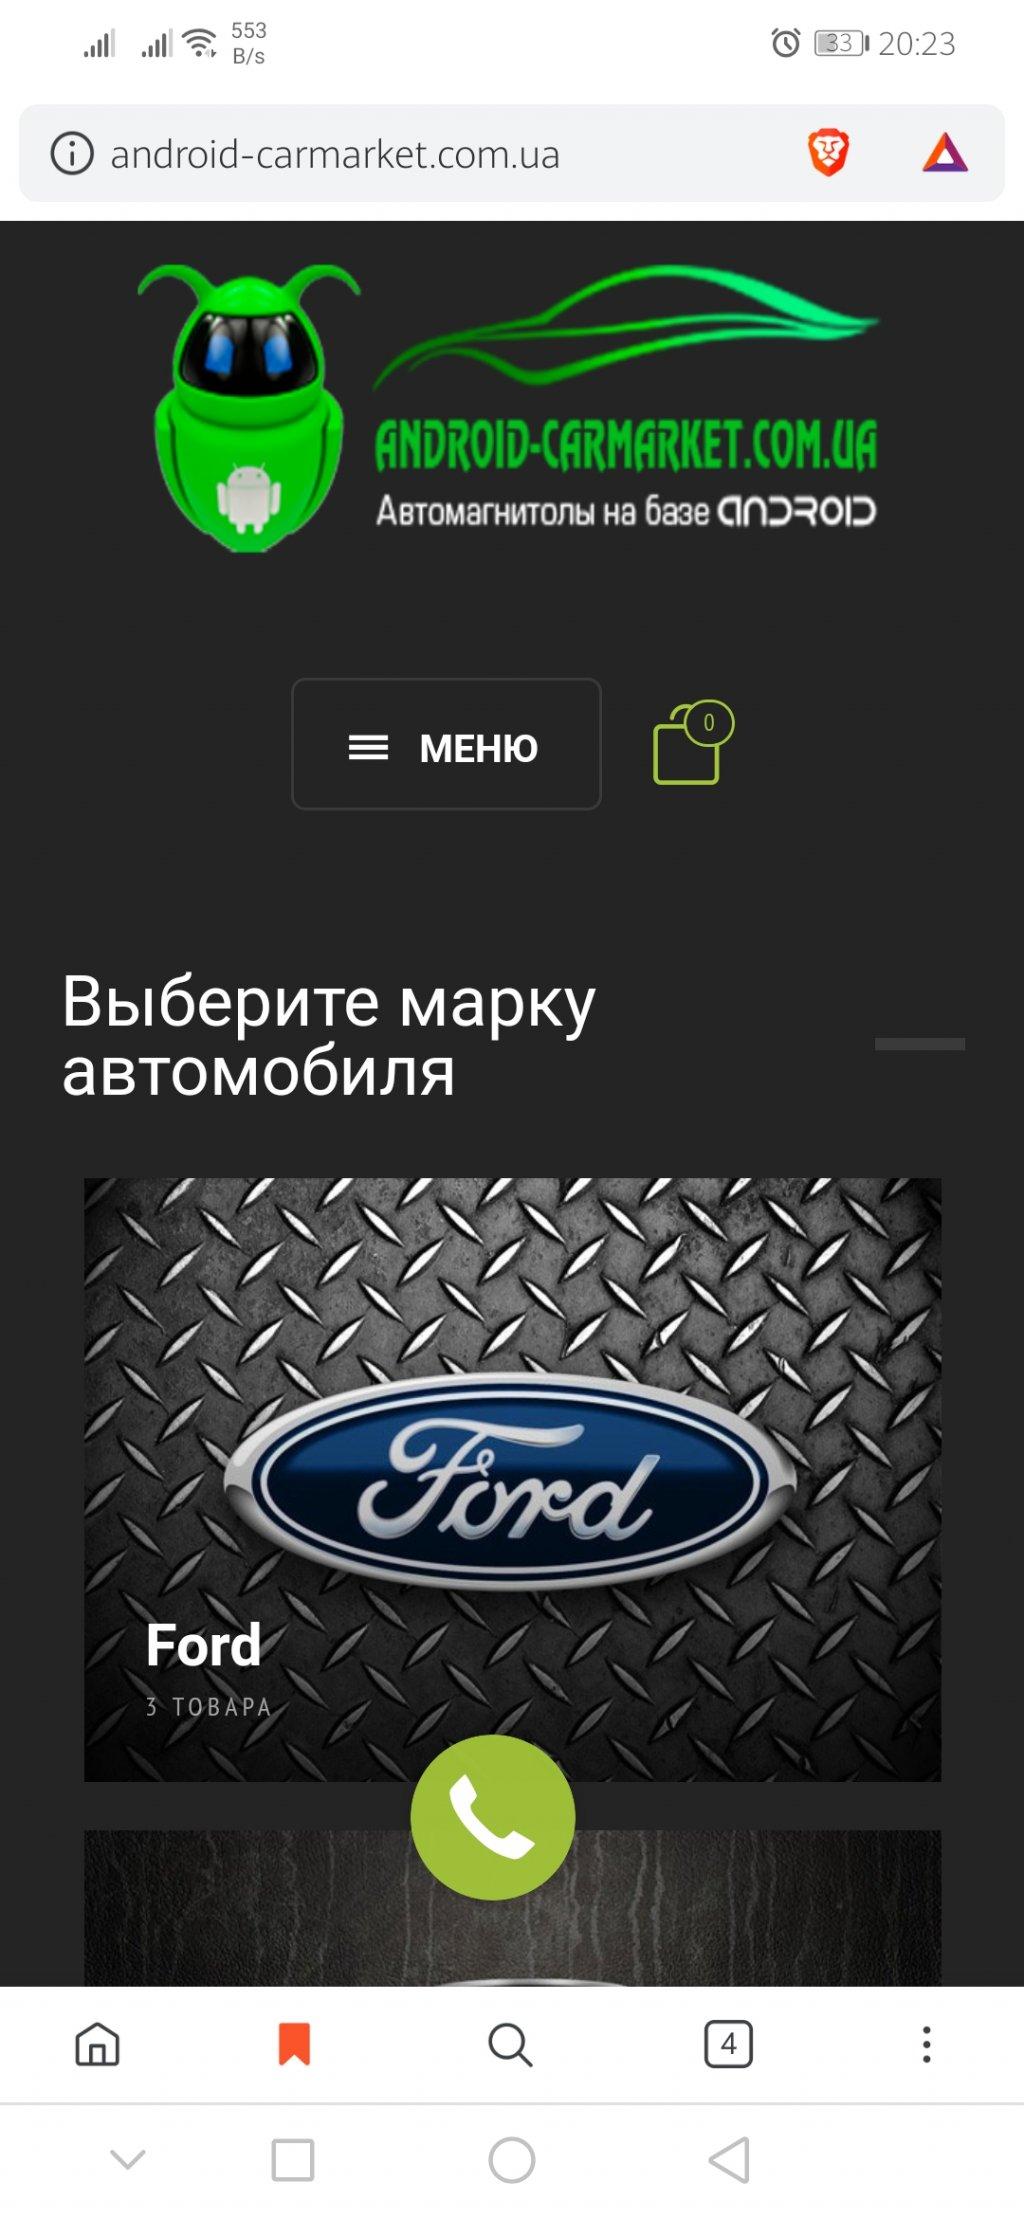 Автомагнитолы - android-carmarket.com.ua